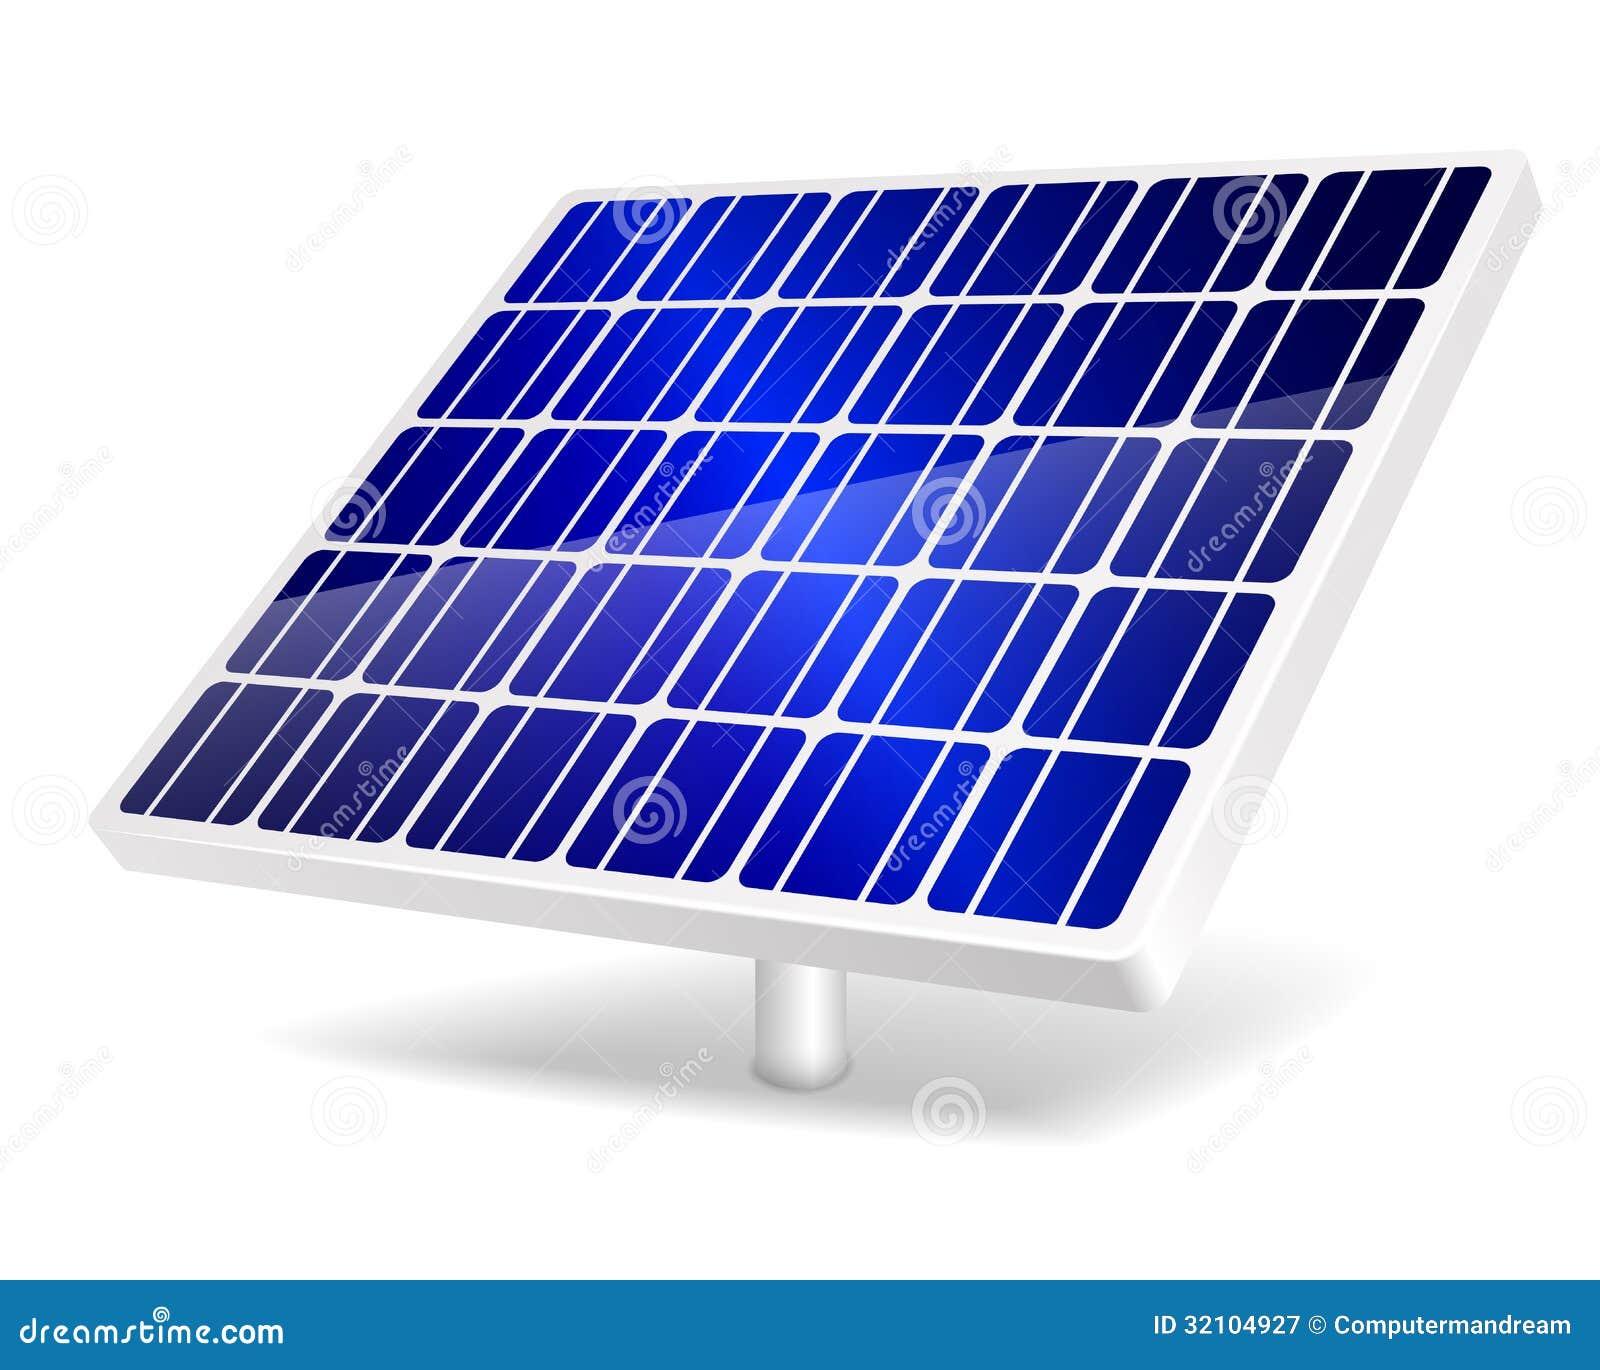 clip art solar power - photo #17